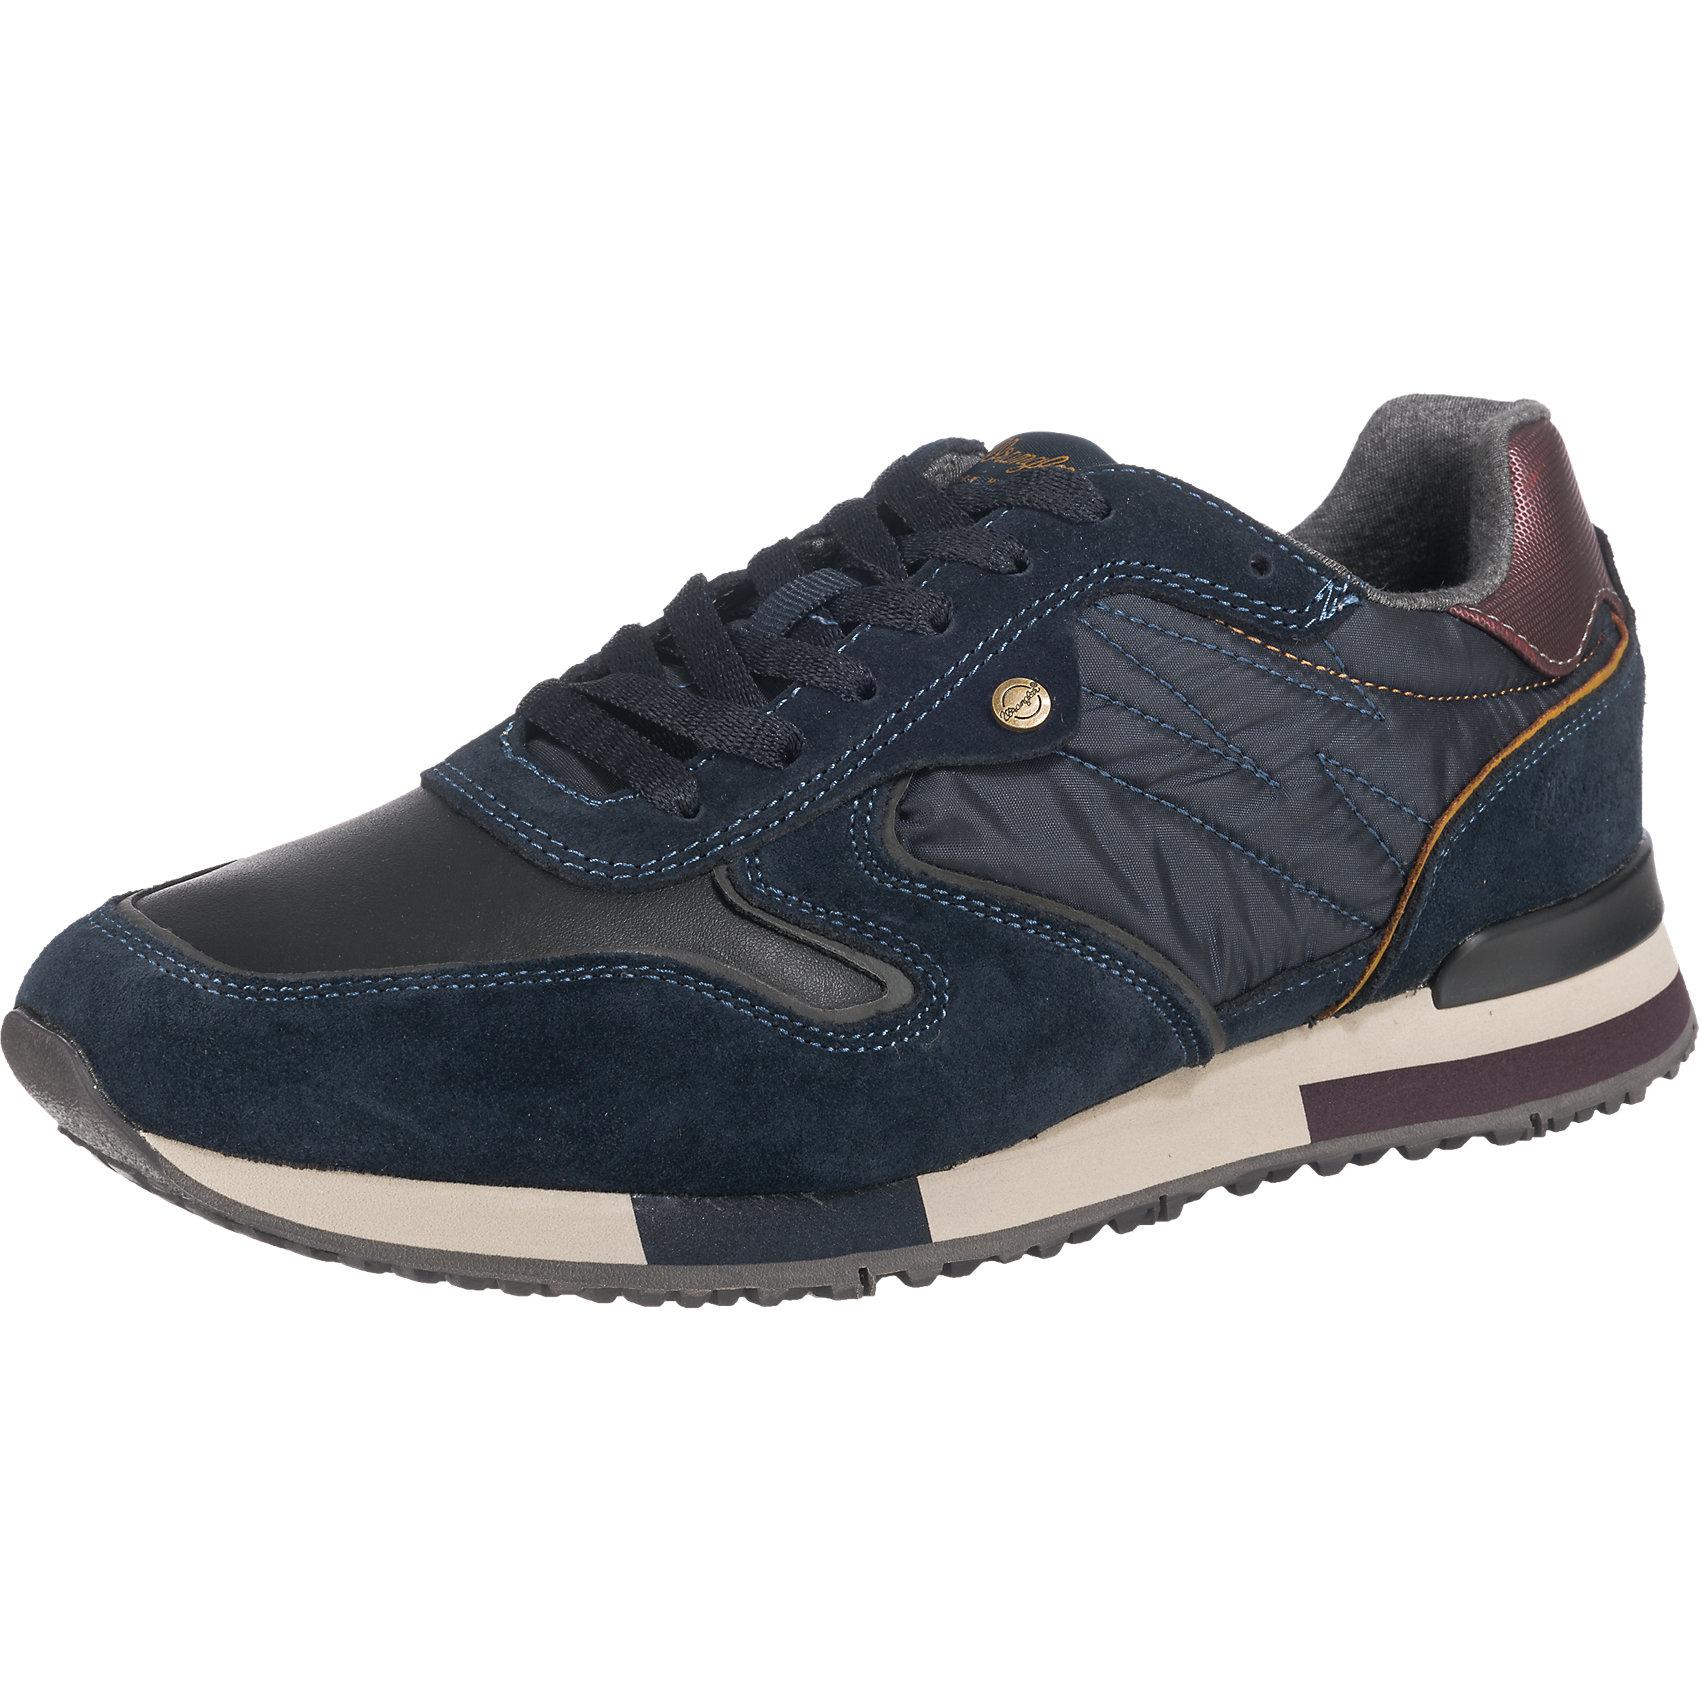 Neu Wrangler Forest Sneakers Low 6830182 Für Herren Grau